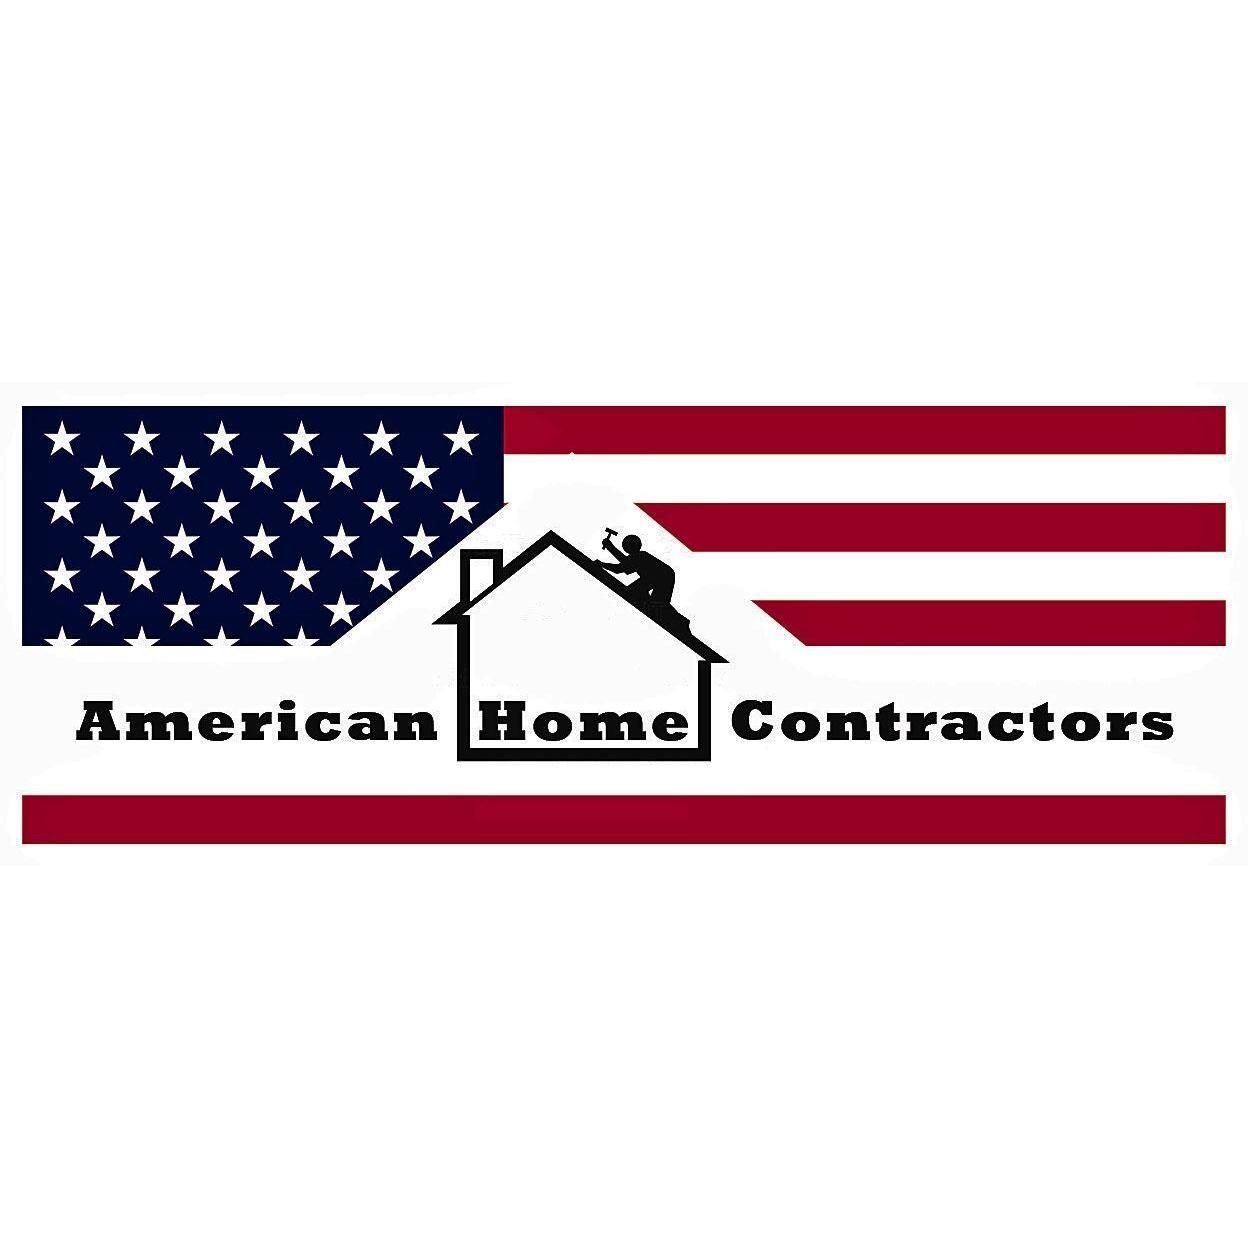 American Home Contractors - Florham Park, NJ - Roofing Contractors